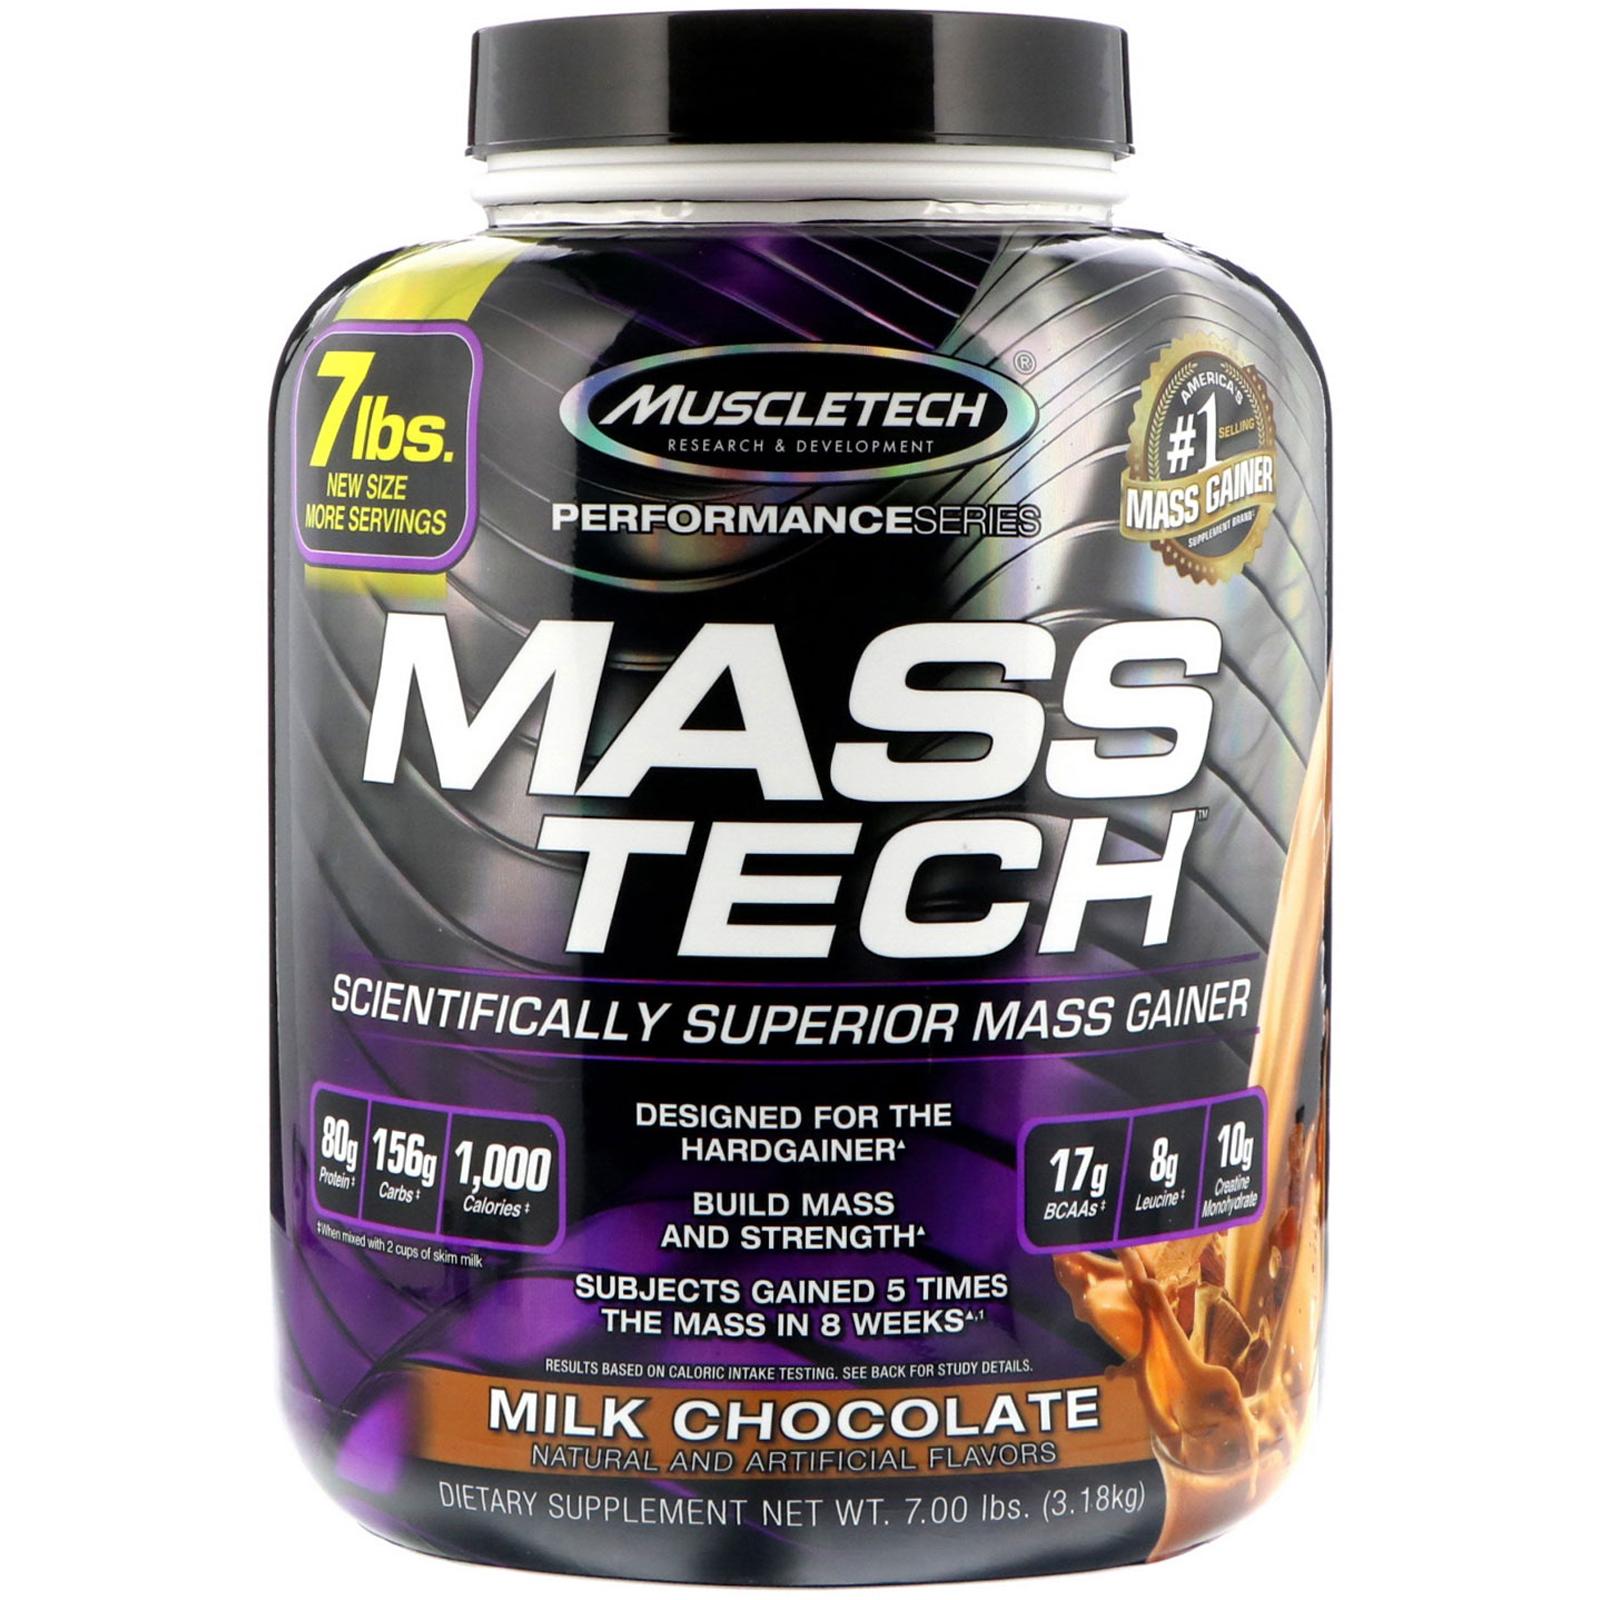 Muscletech, Mass-Tech, Scientifically Superior Mass Gainer Protein Powder, Milk Chocolate, 7.00 lb (3.18 kg)